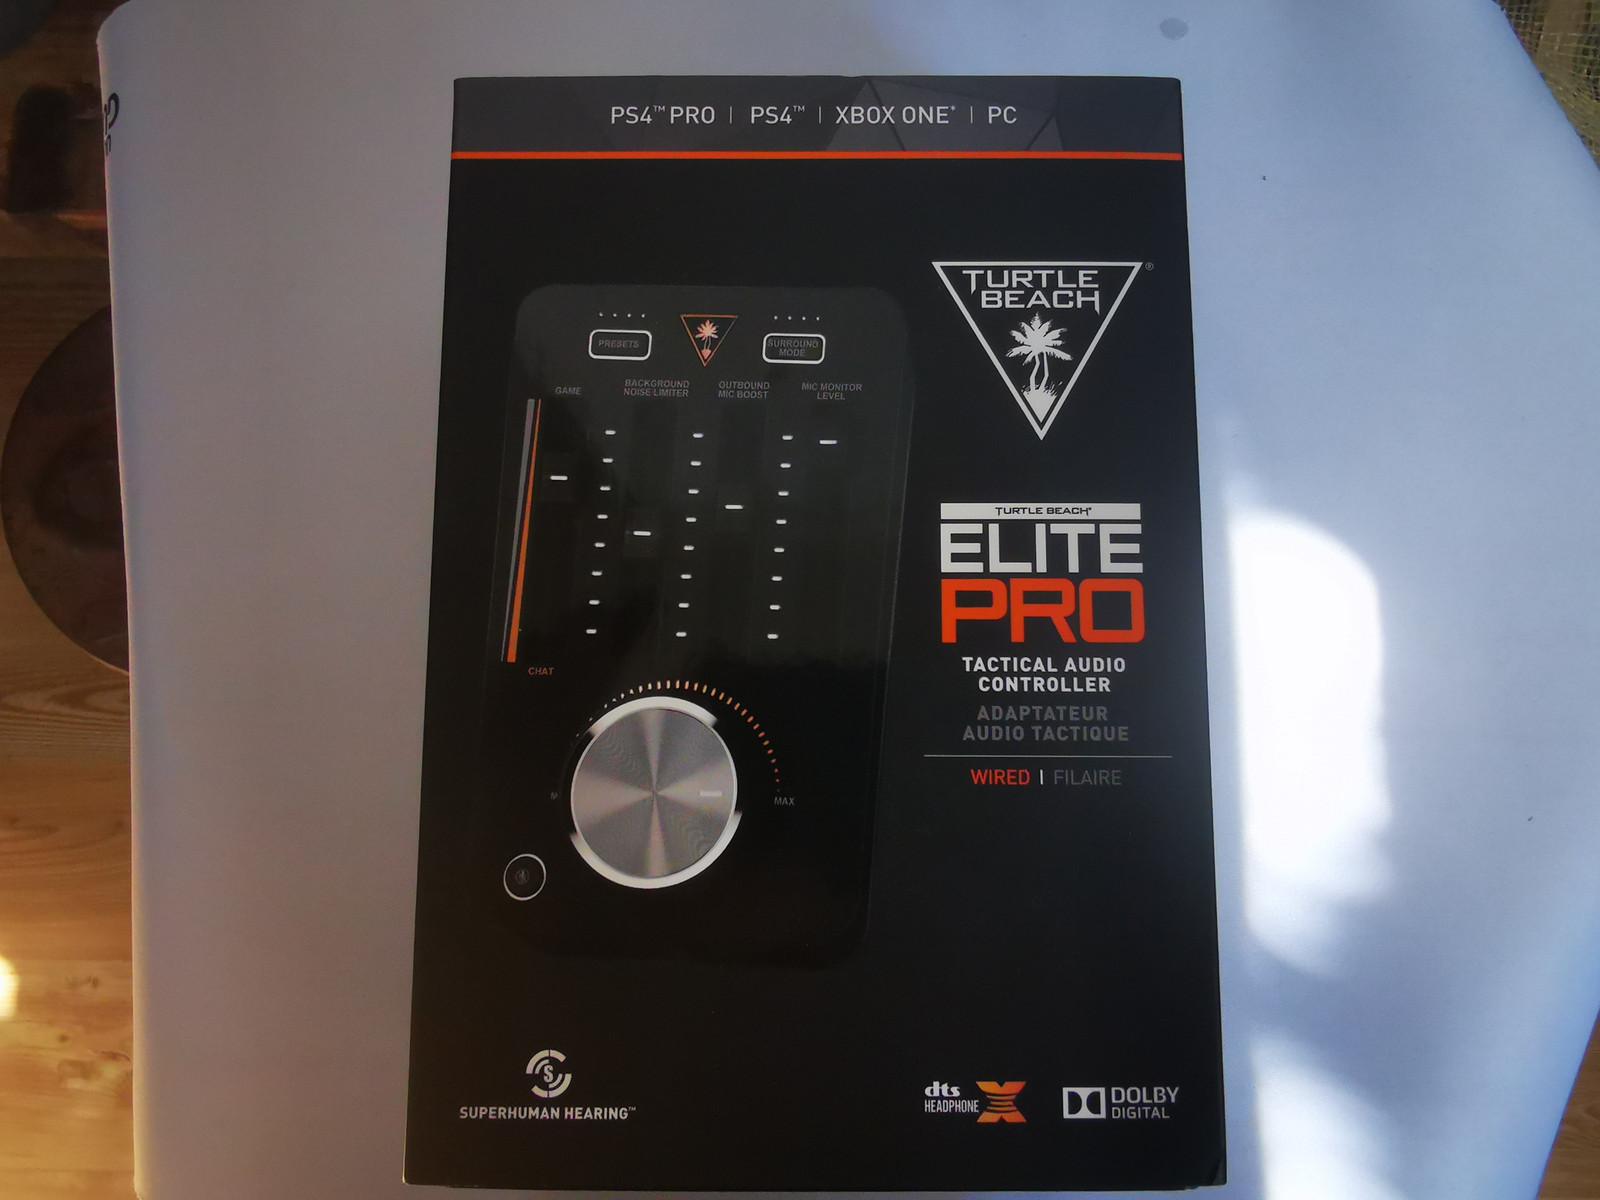 Turtle Beach Elite Pro Tactical lydkontroll Streaming og